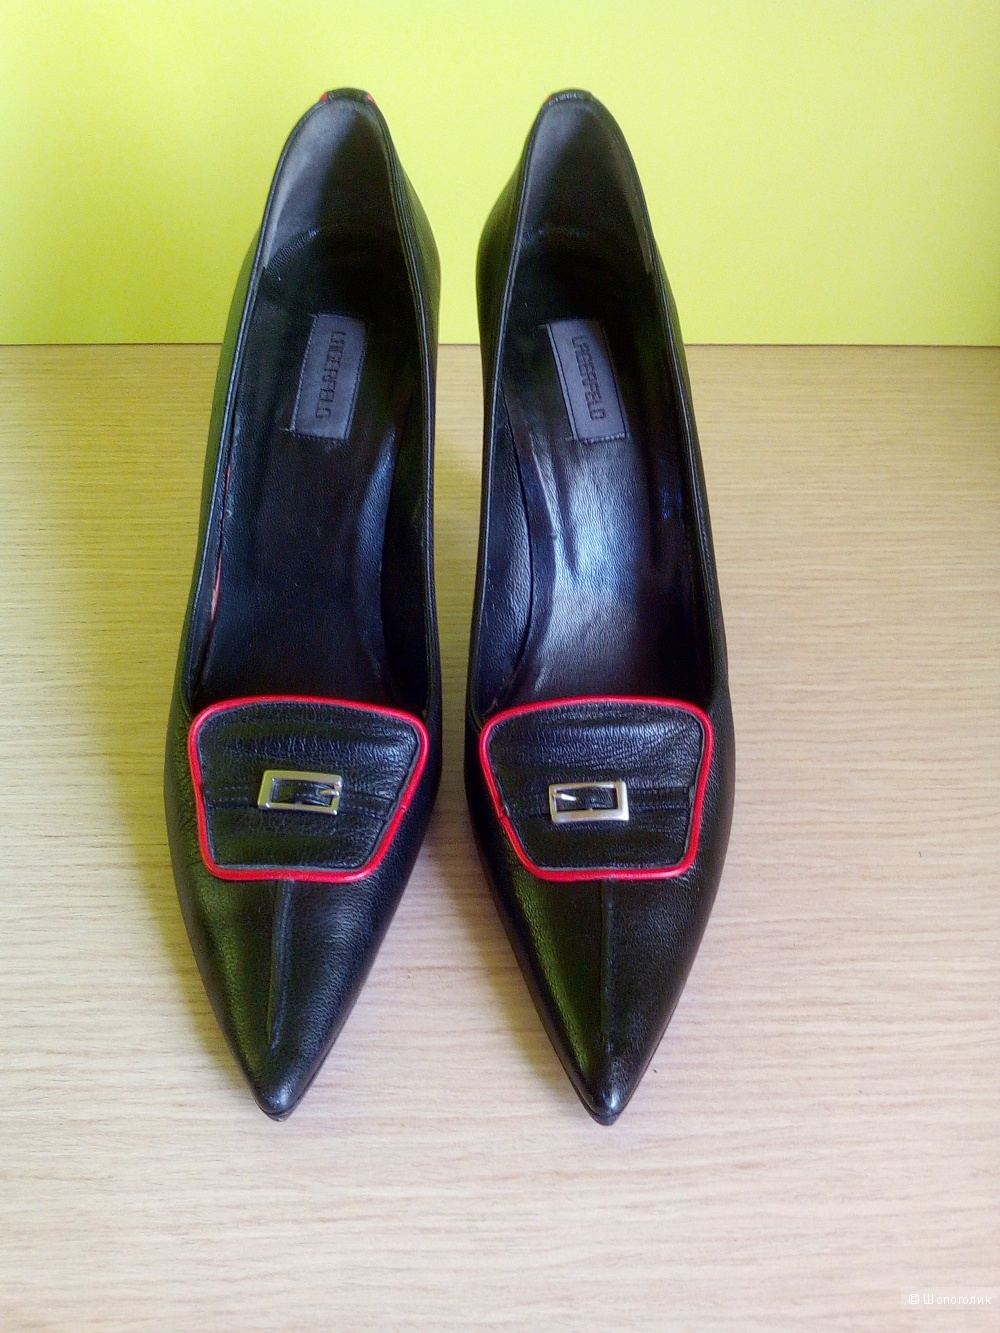 Туфли Lagerfeld, 38 размера